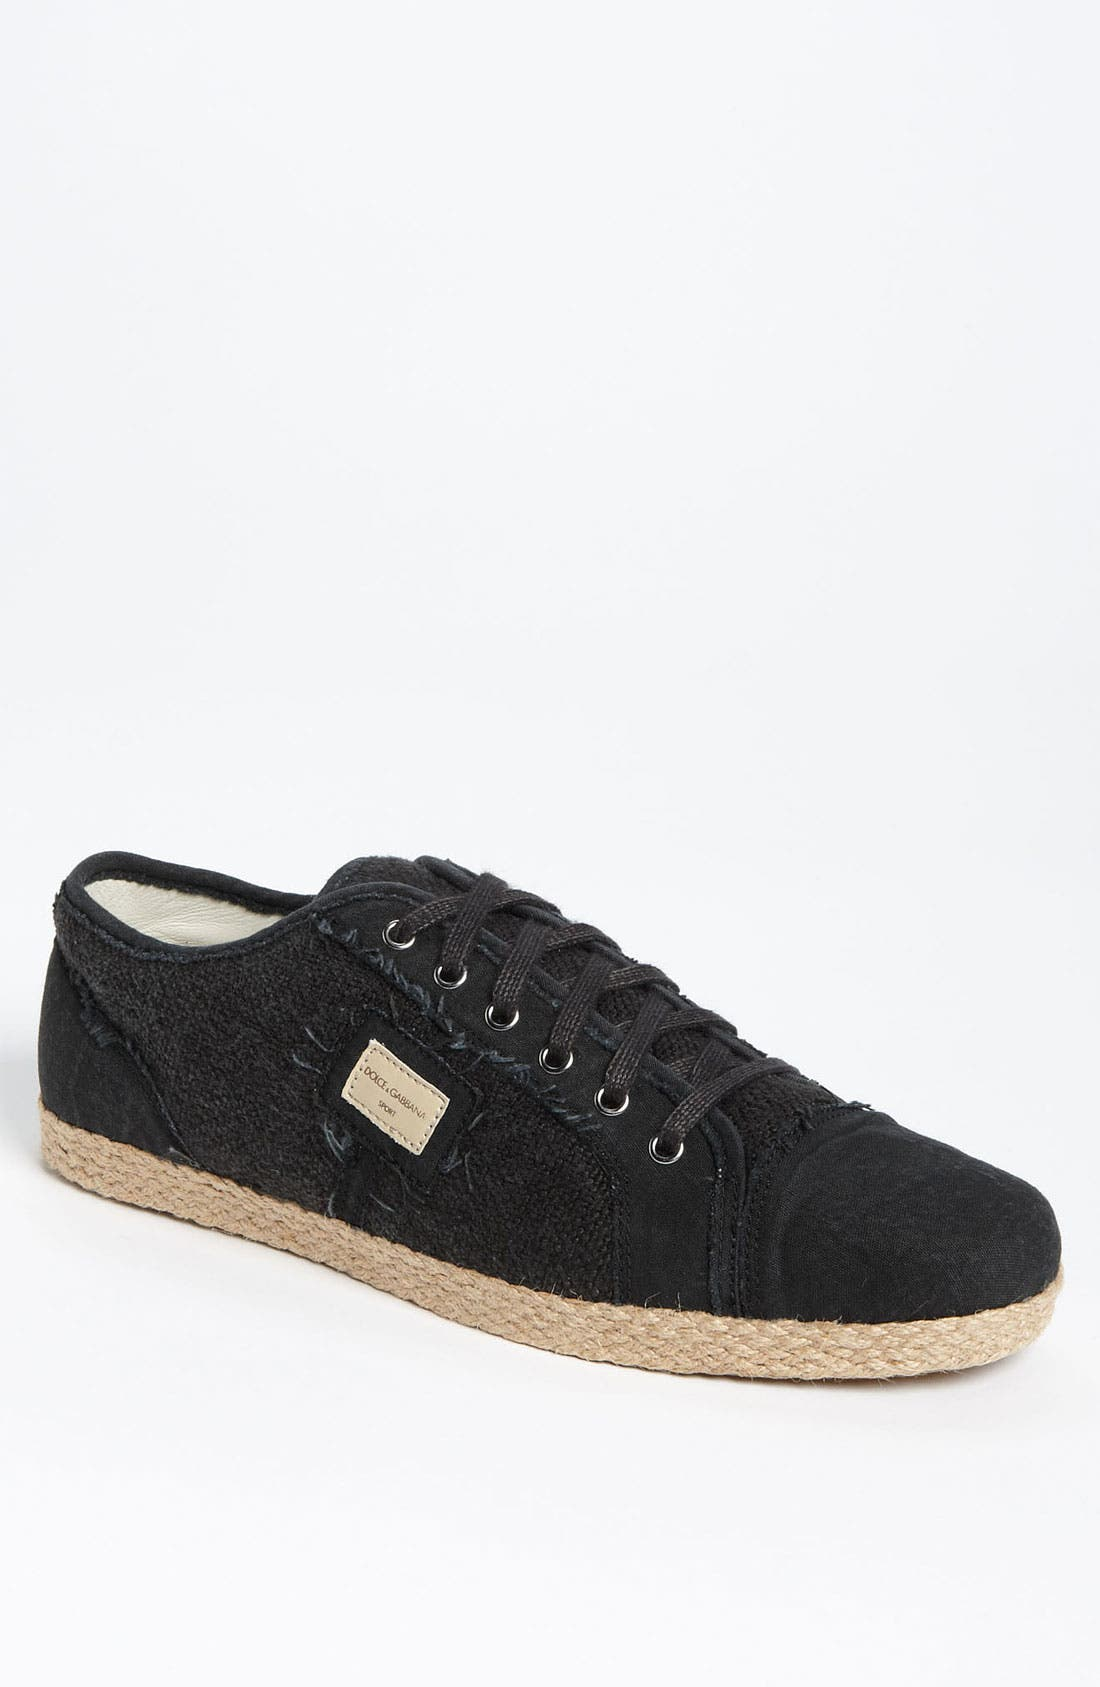 Main Image - Dolce&Gabbana Espadrille Sneaker